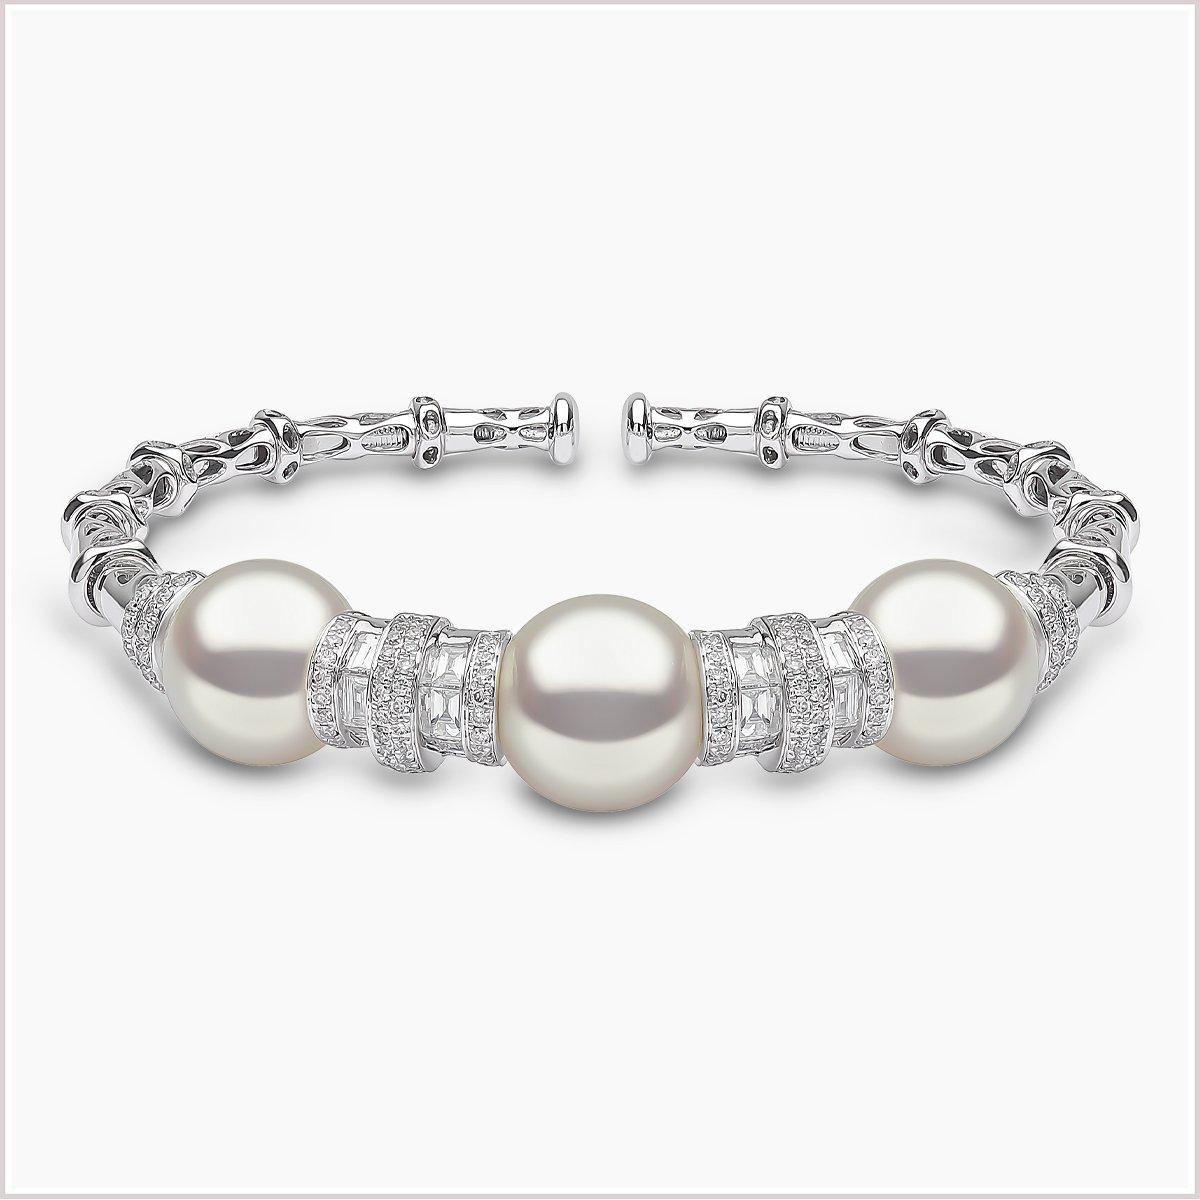 Yoko London Starlight Diamond and South Sea Pearl Bracelet